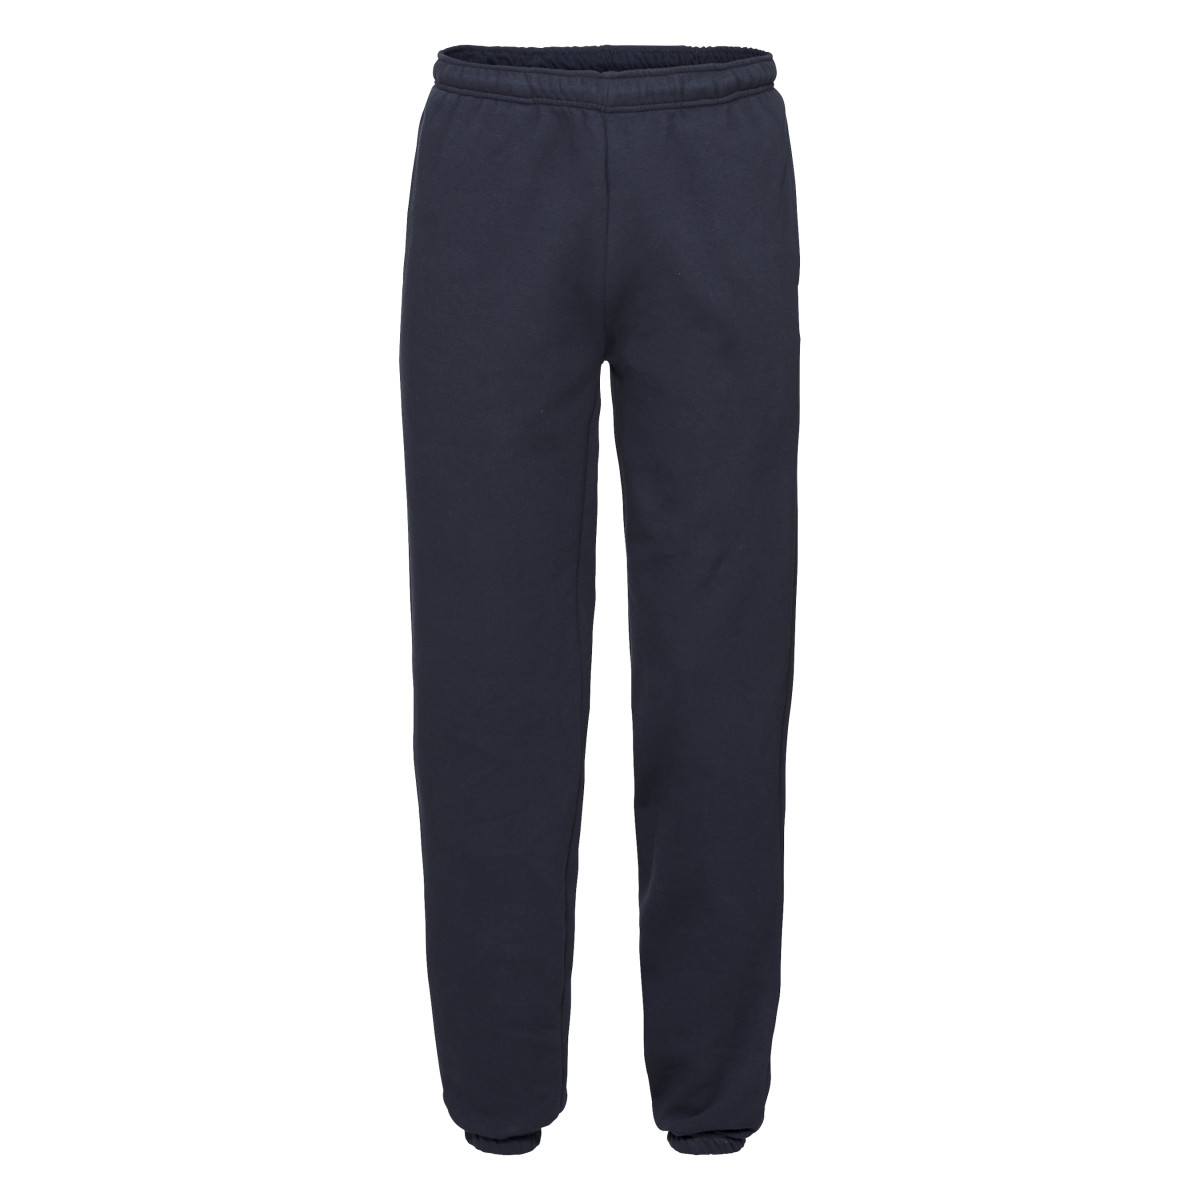 FOTL Mens Premium Jog Pants